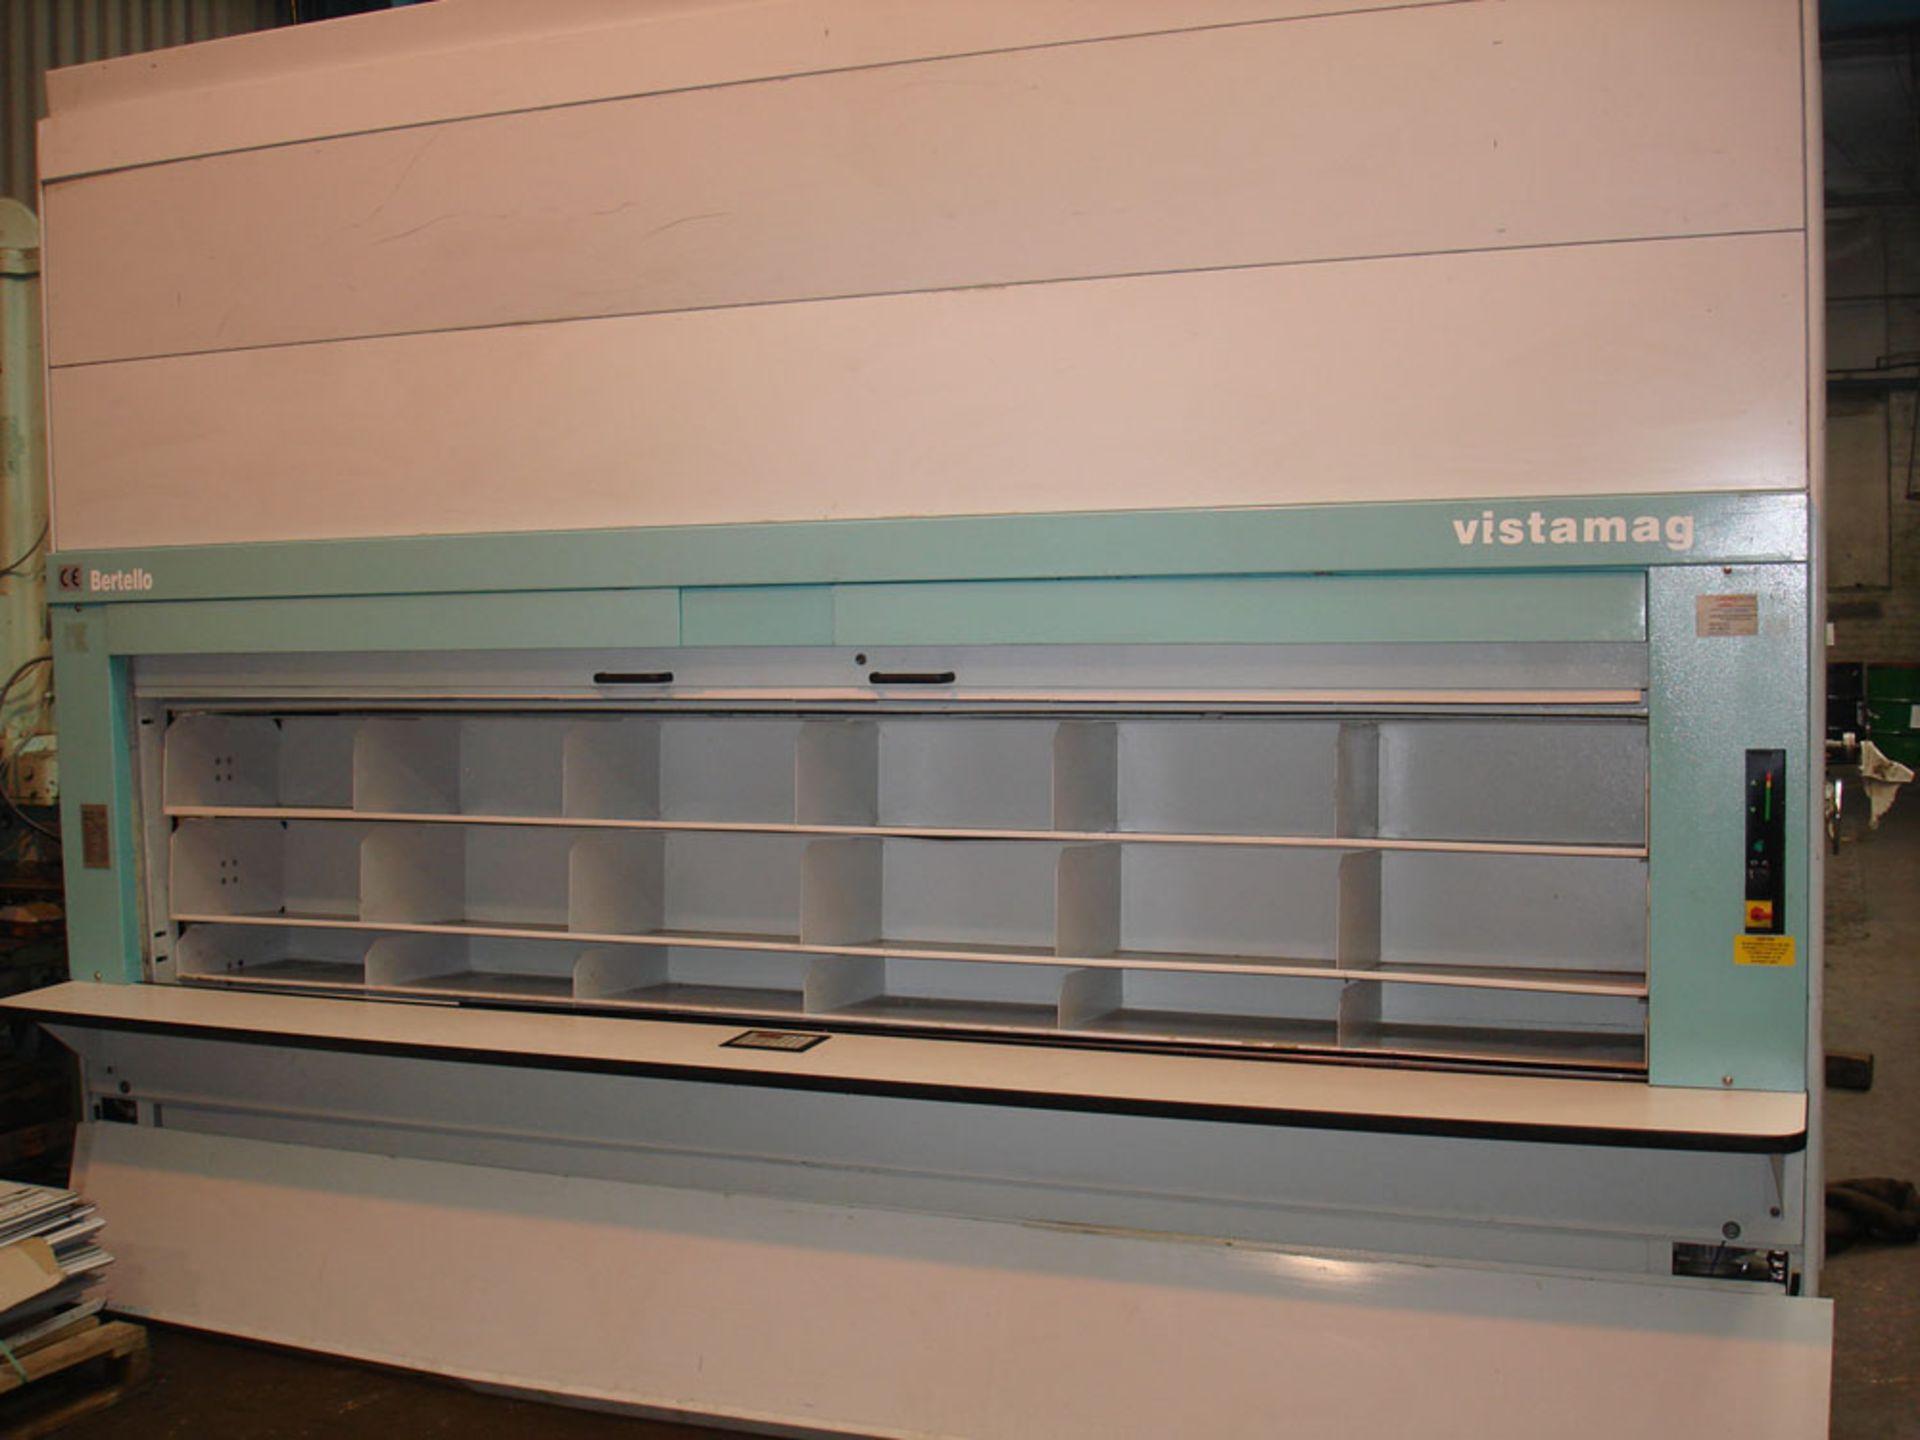 Bertello Vistamag Storage Carousel. - Image 2 of 6